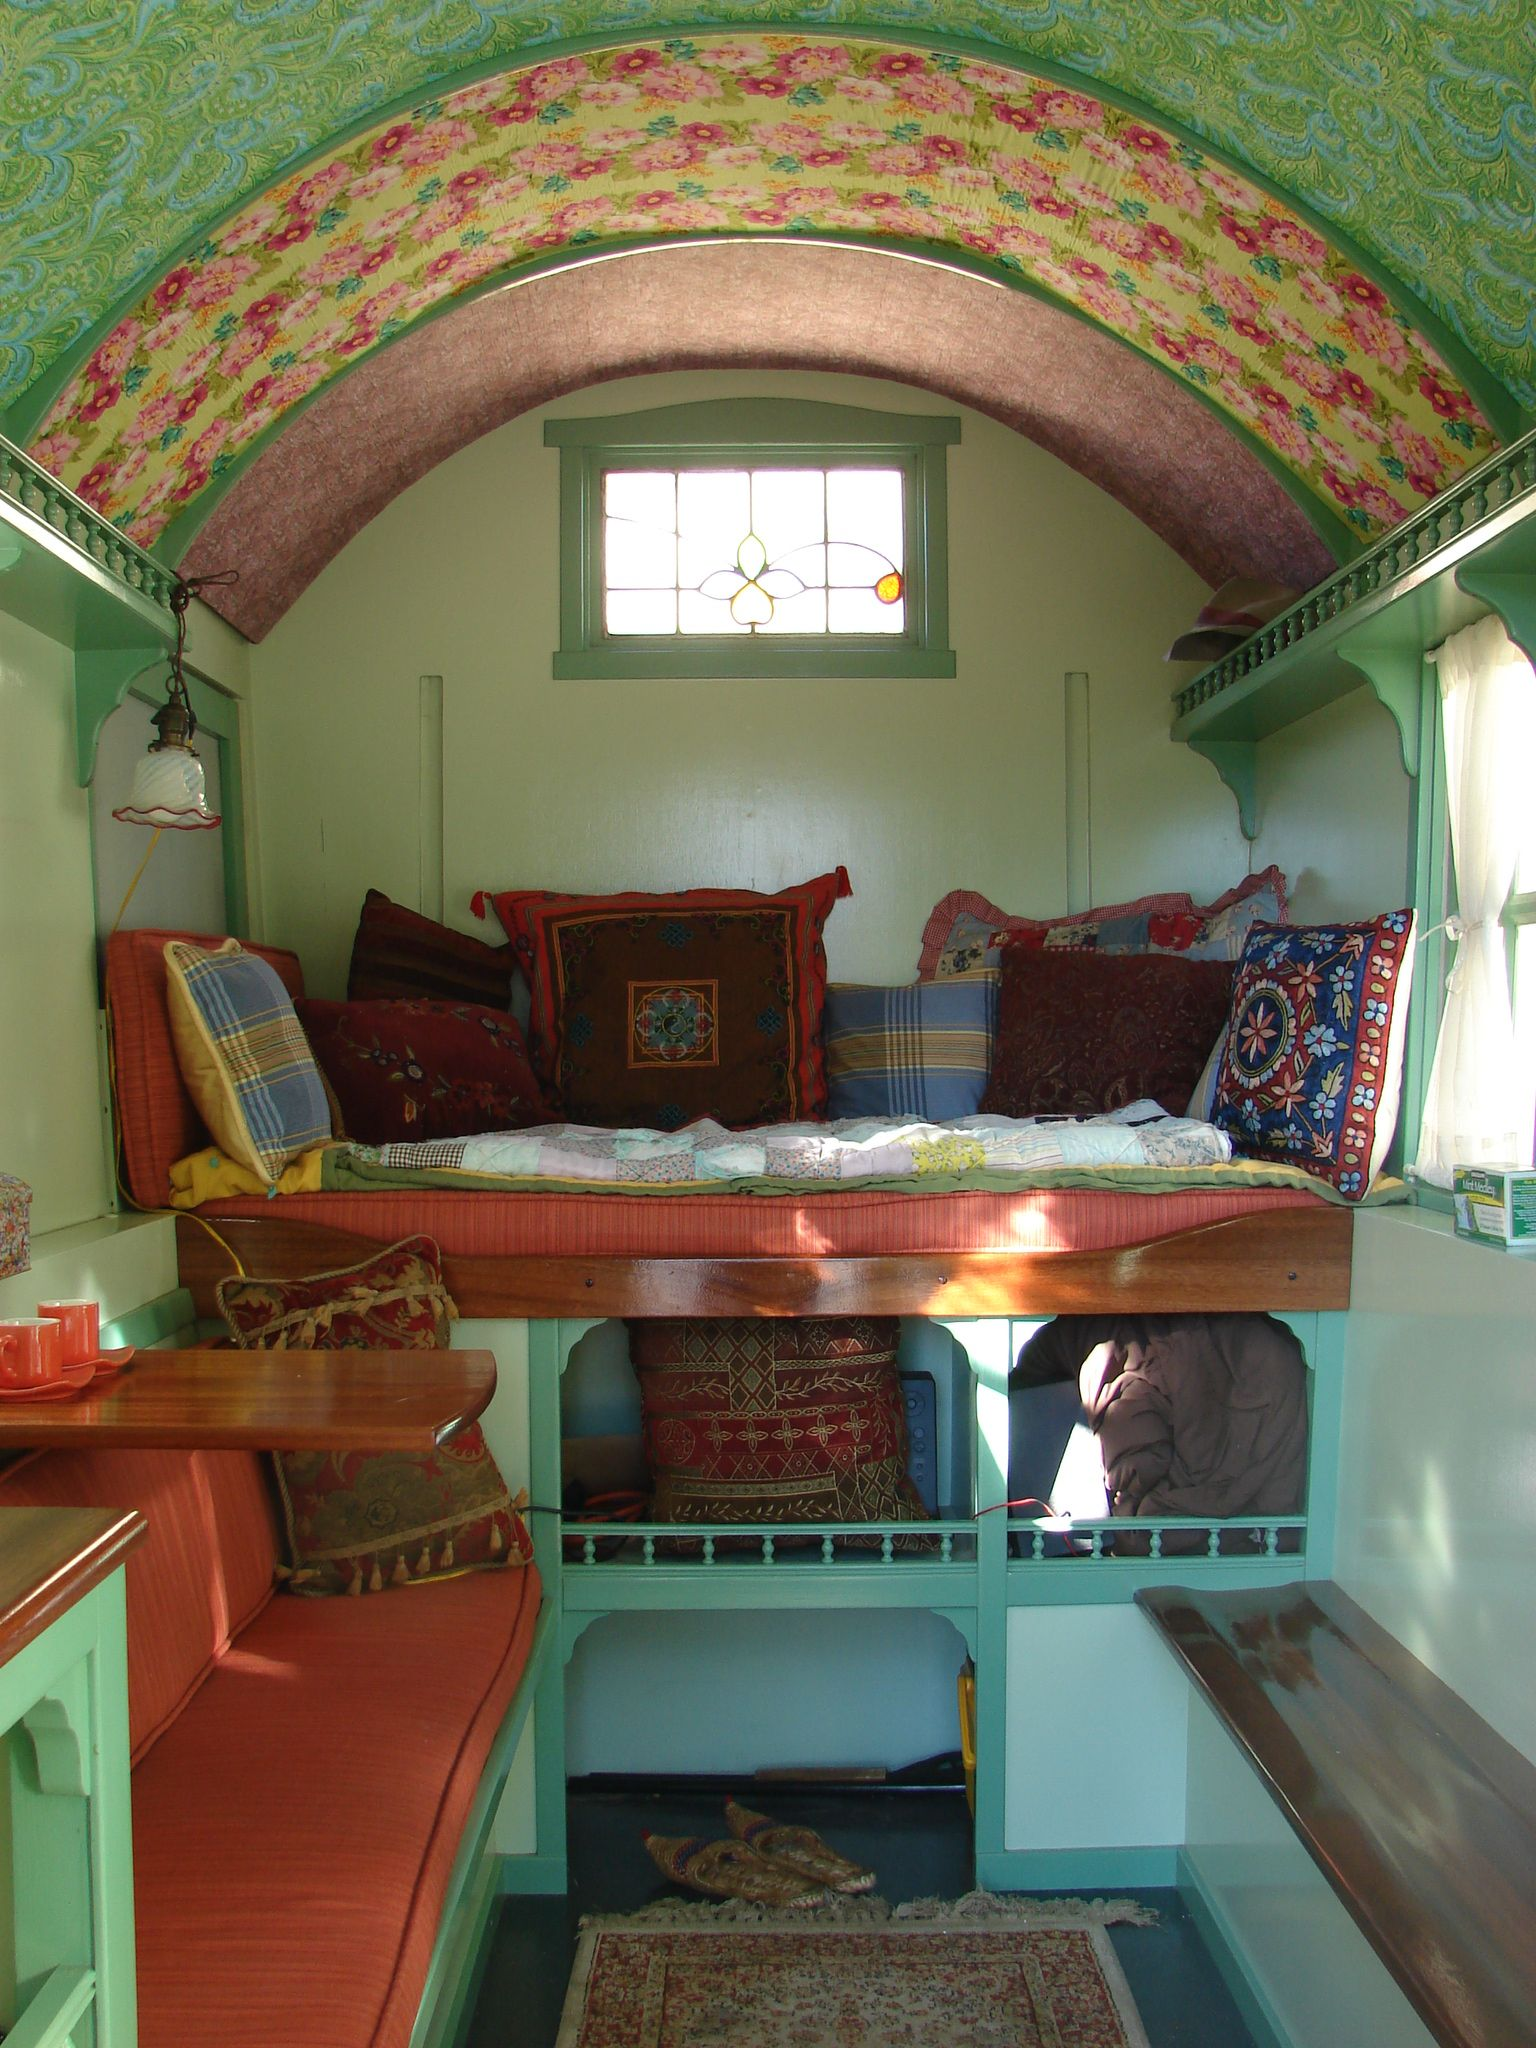 great vardo interior love the colors vardo dreams pinterest roulotte caravane et boh me. Black Bedroom Furniture Sets. Home Design Ideas